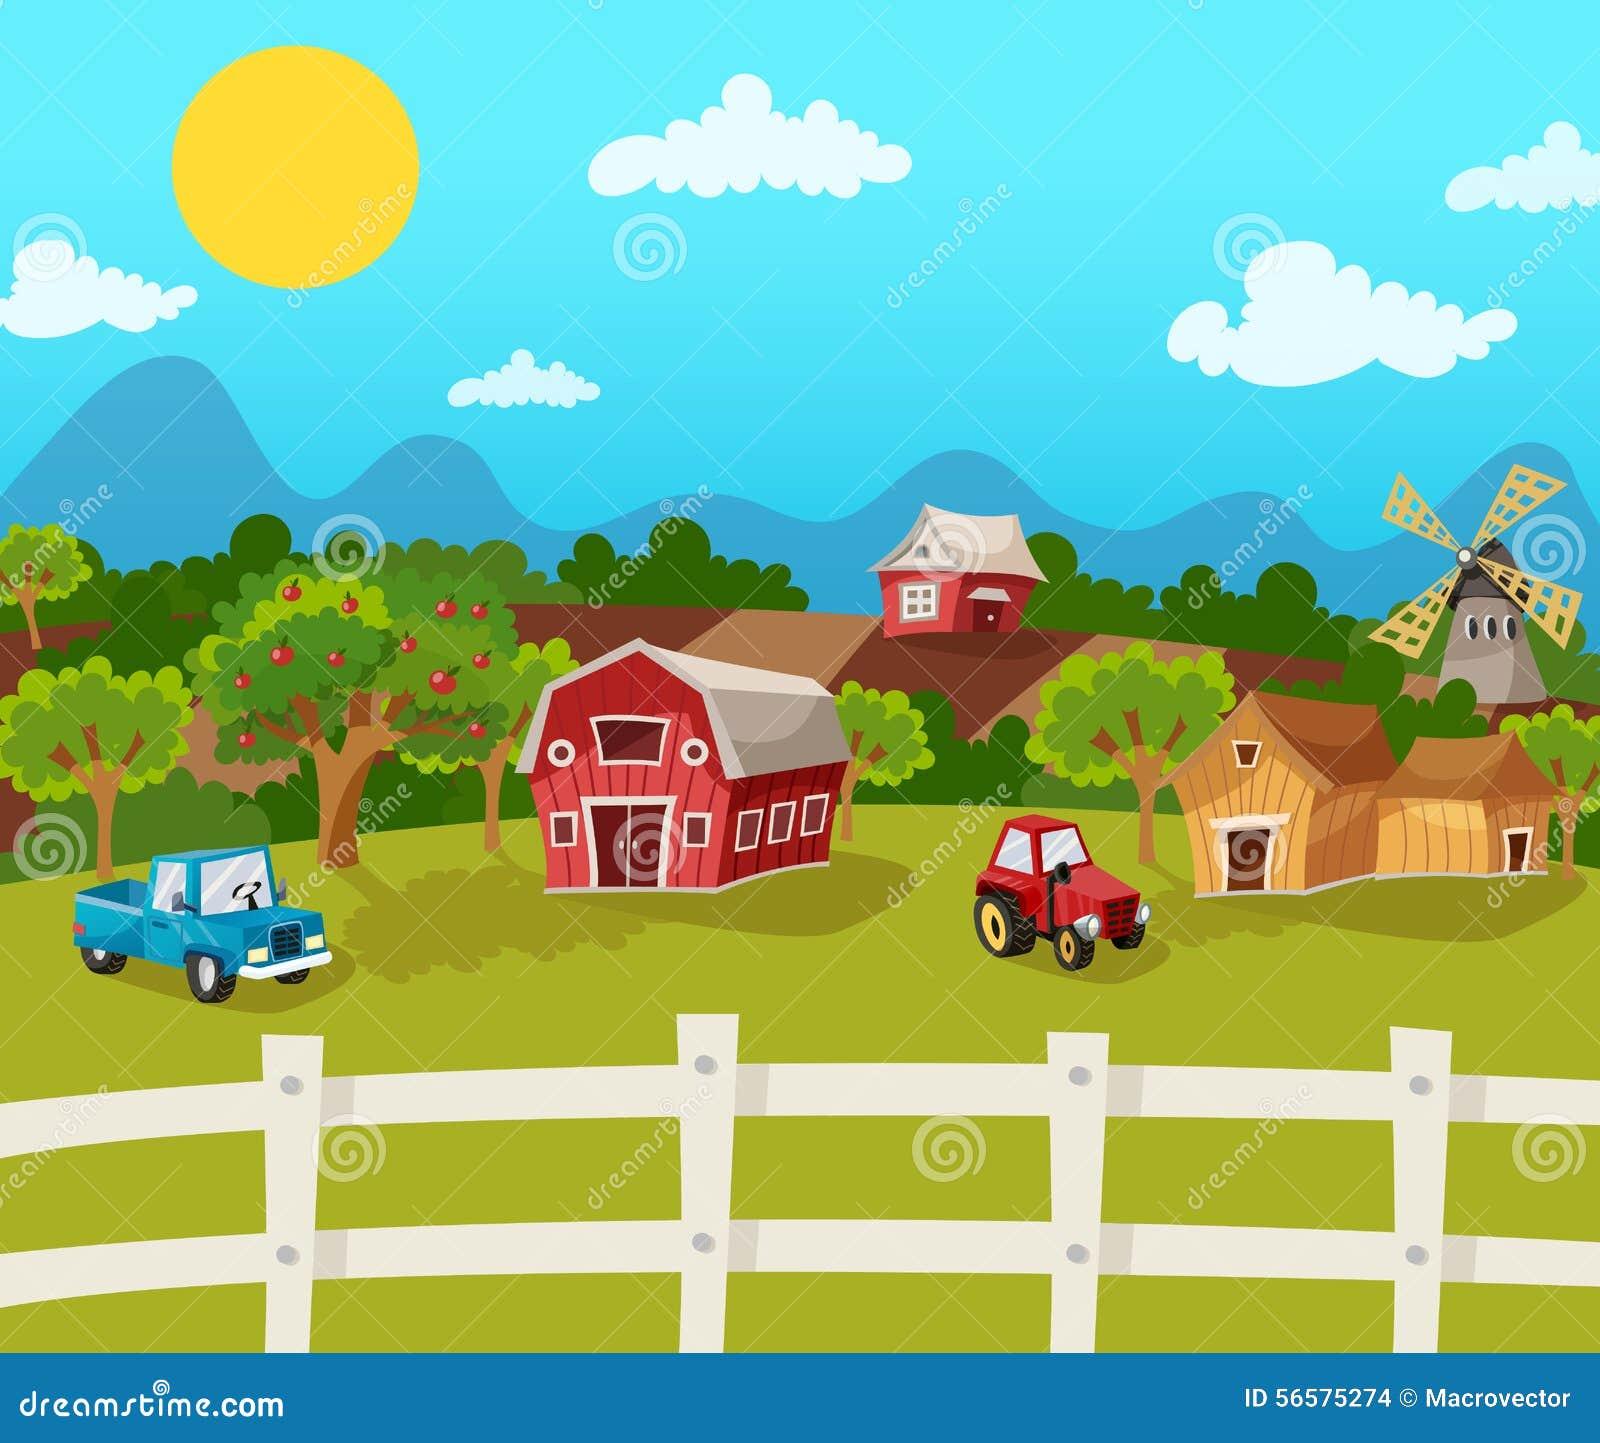 Farm Cartoon Background With Apple Garden In Rural Landscape Vector